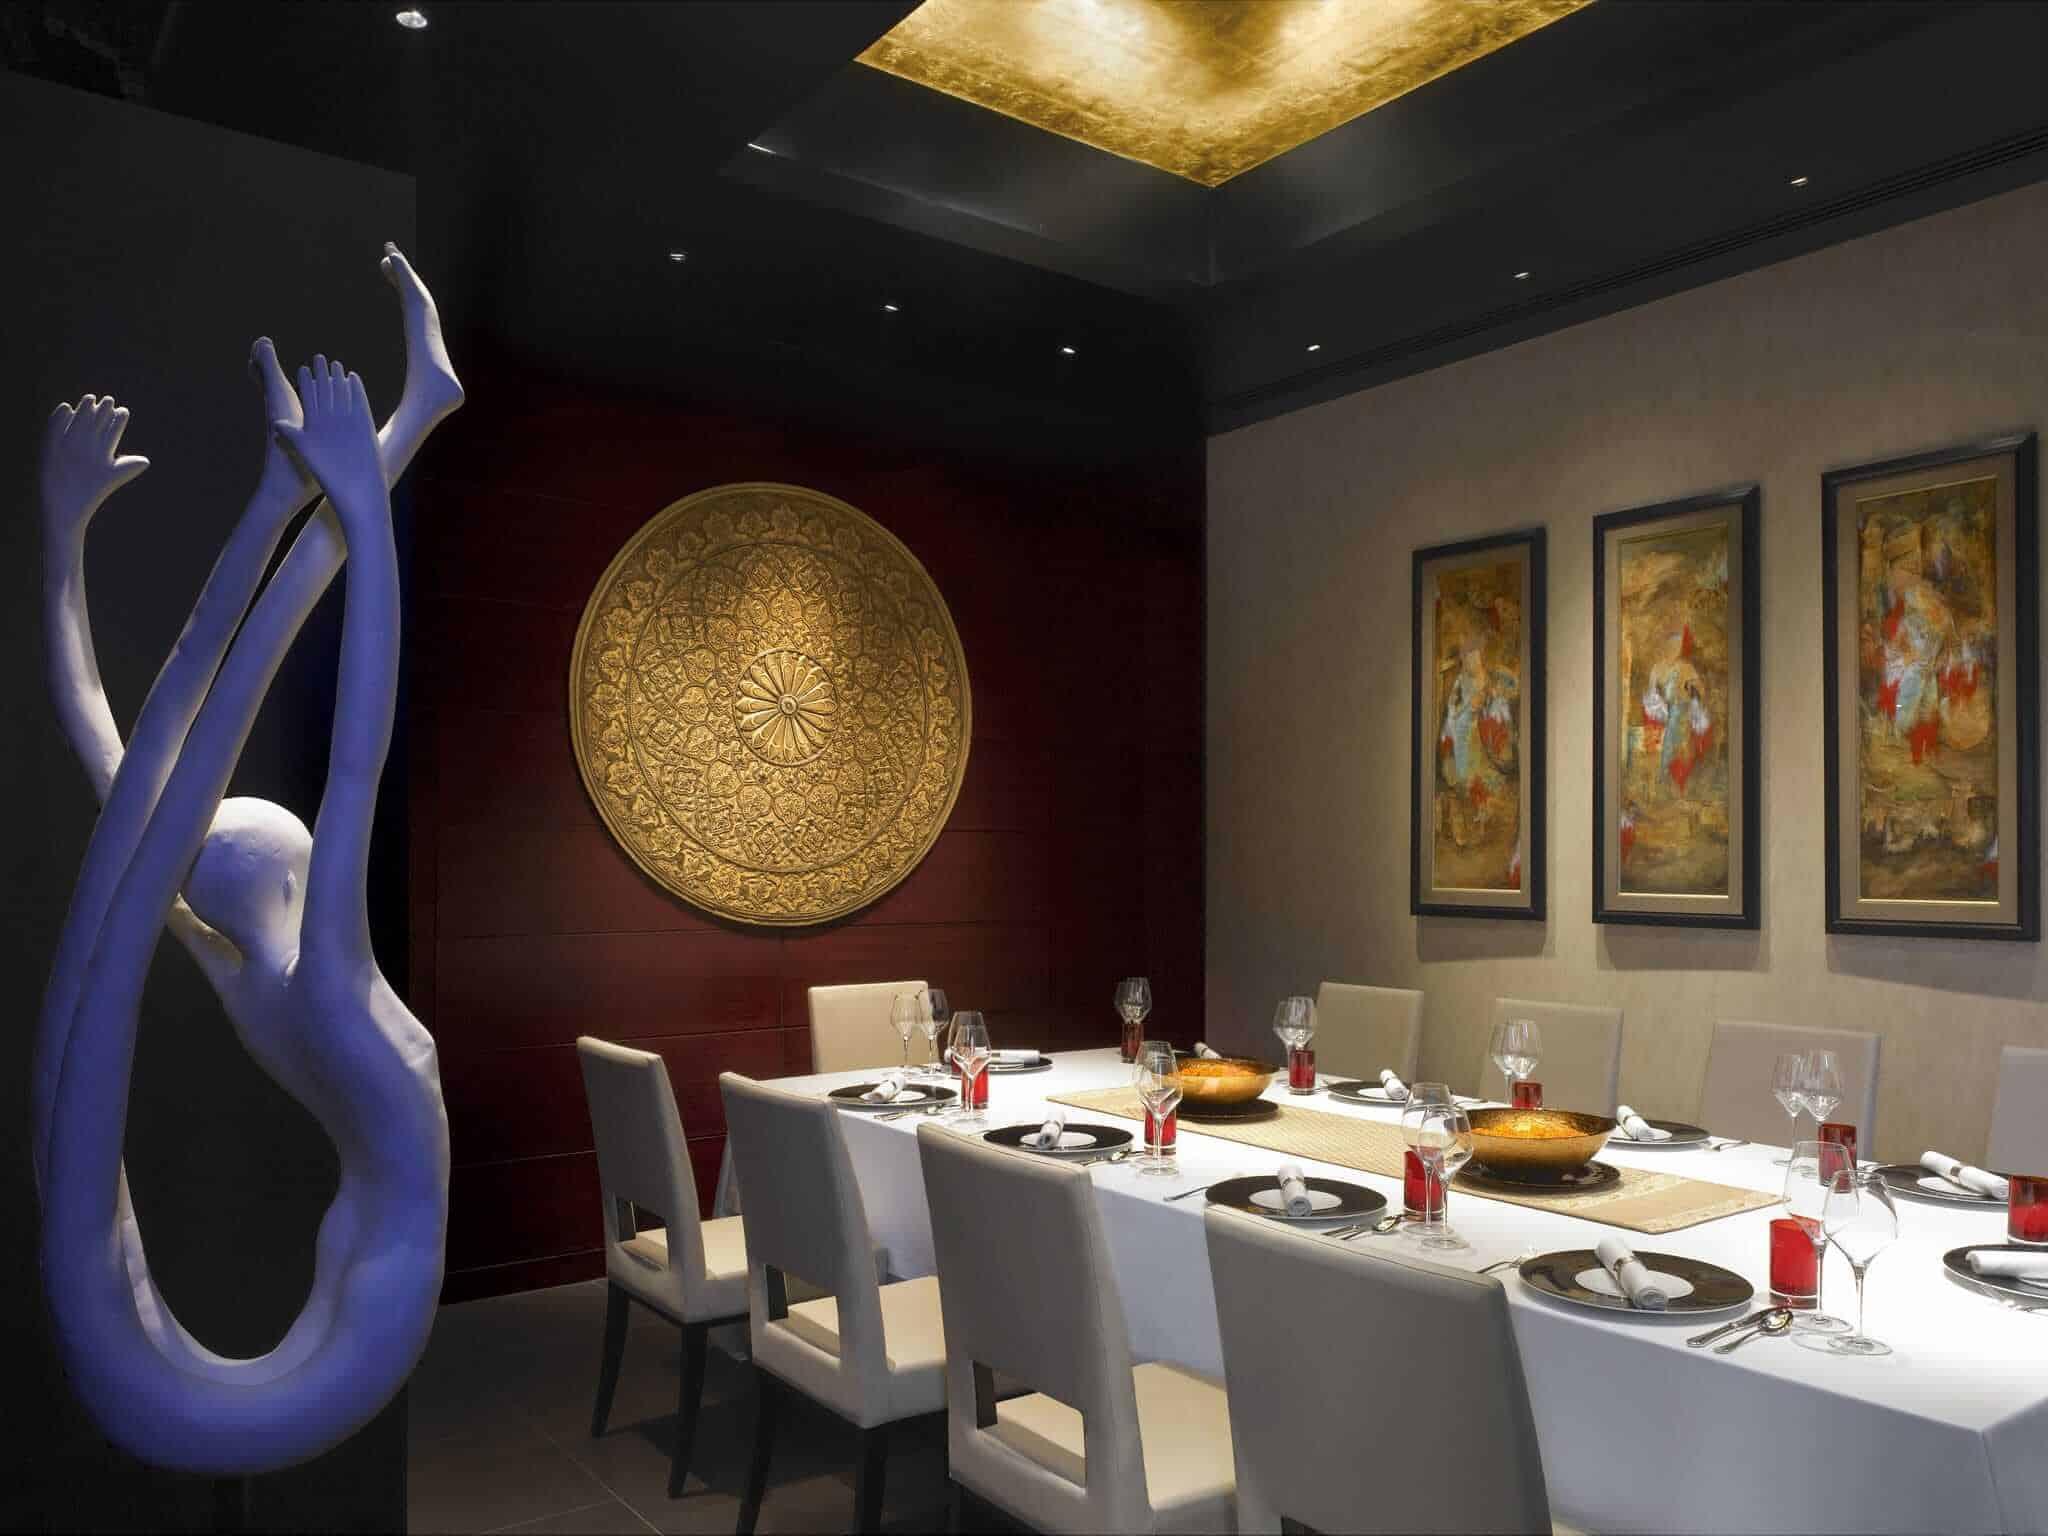 Varq restaurant, Taj Mahal Hotel, Delhi, India